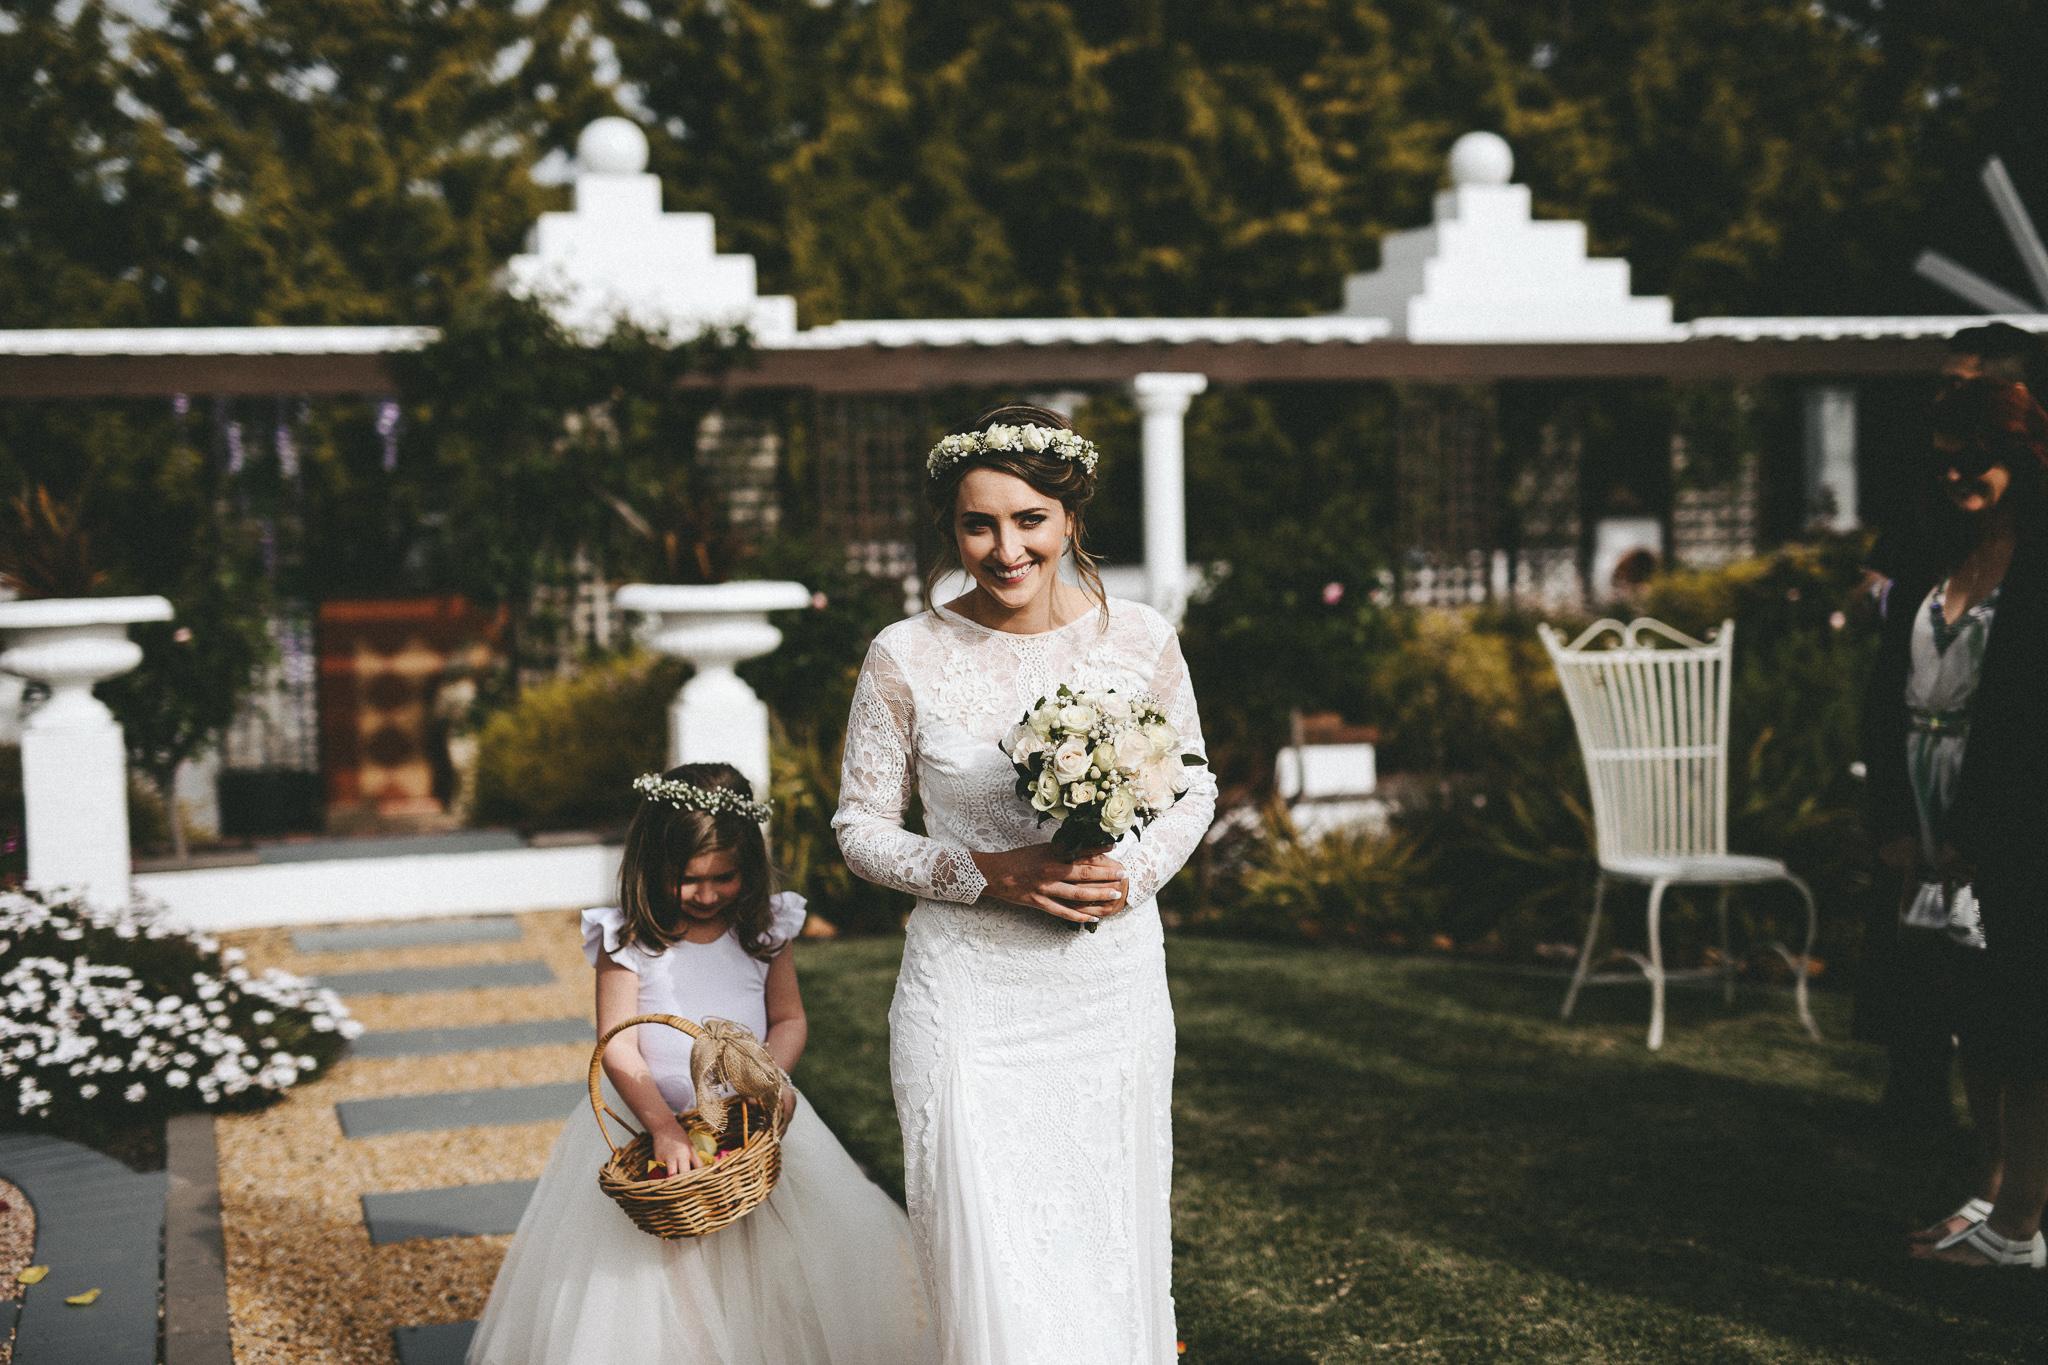 christopher morrison_adelaide hills wedding_ andy + teegan_44_0533.jpg